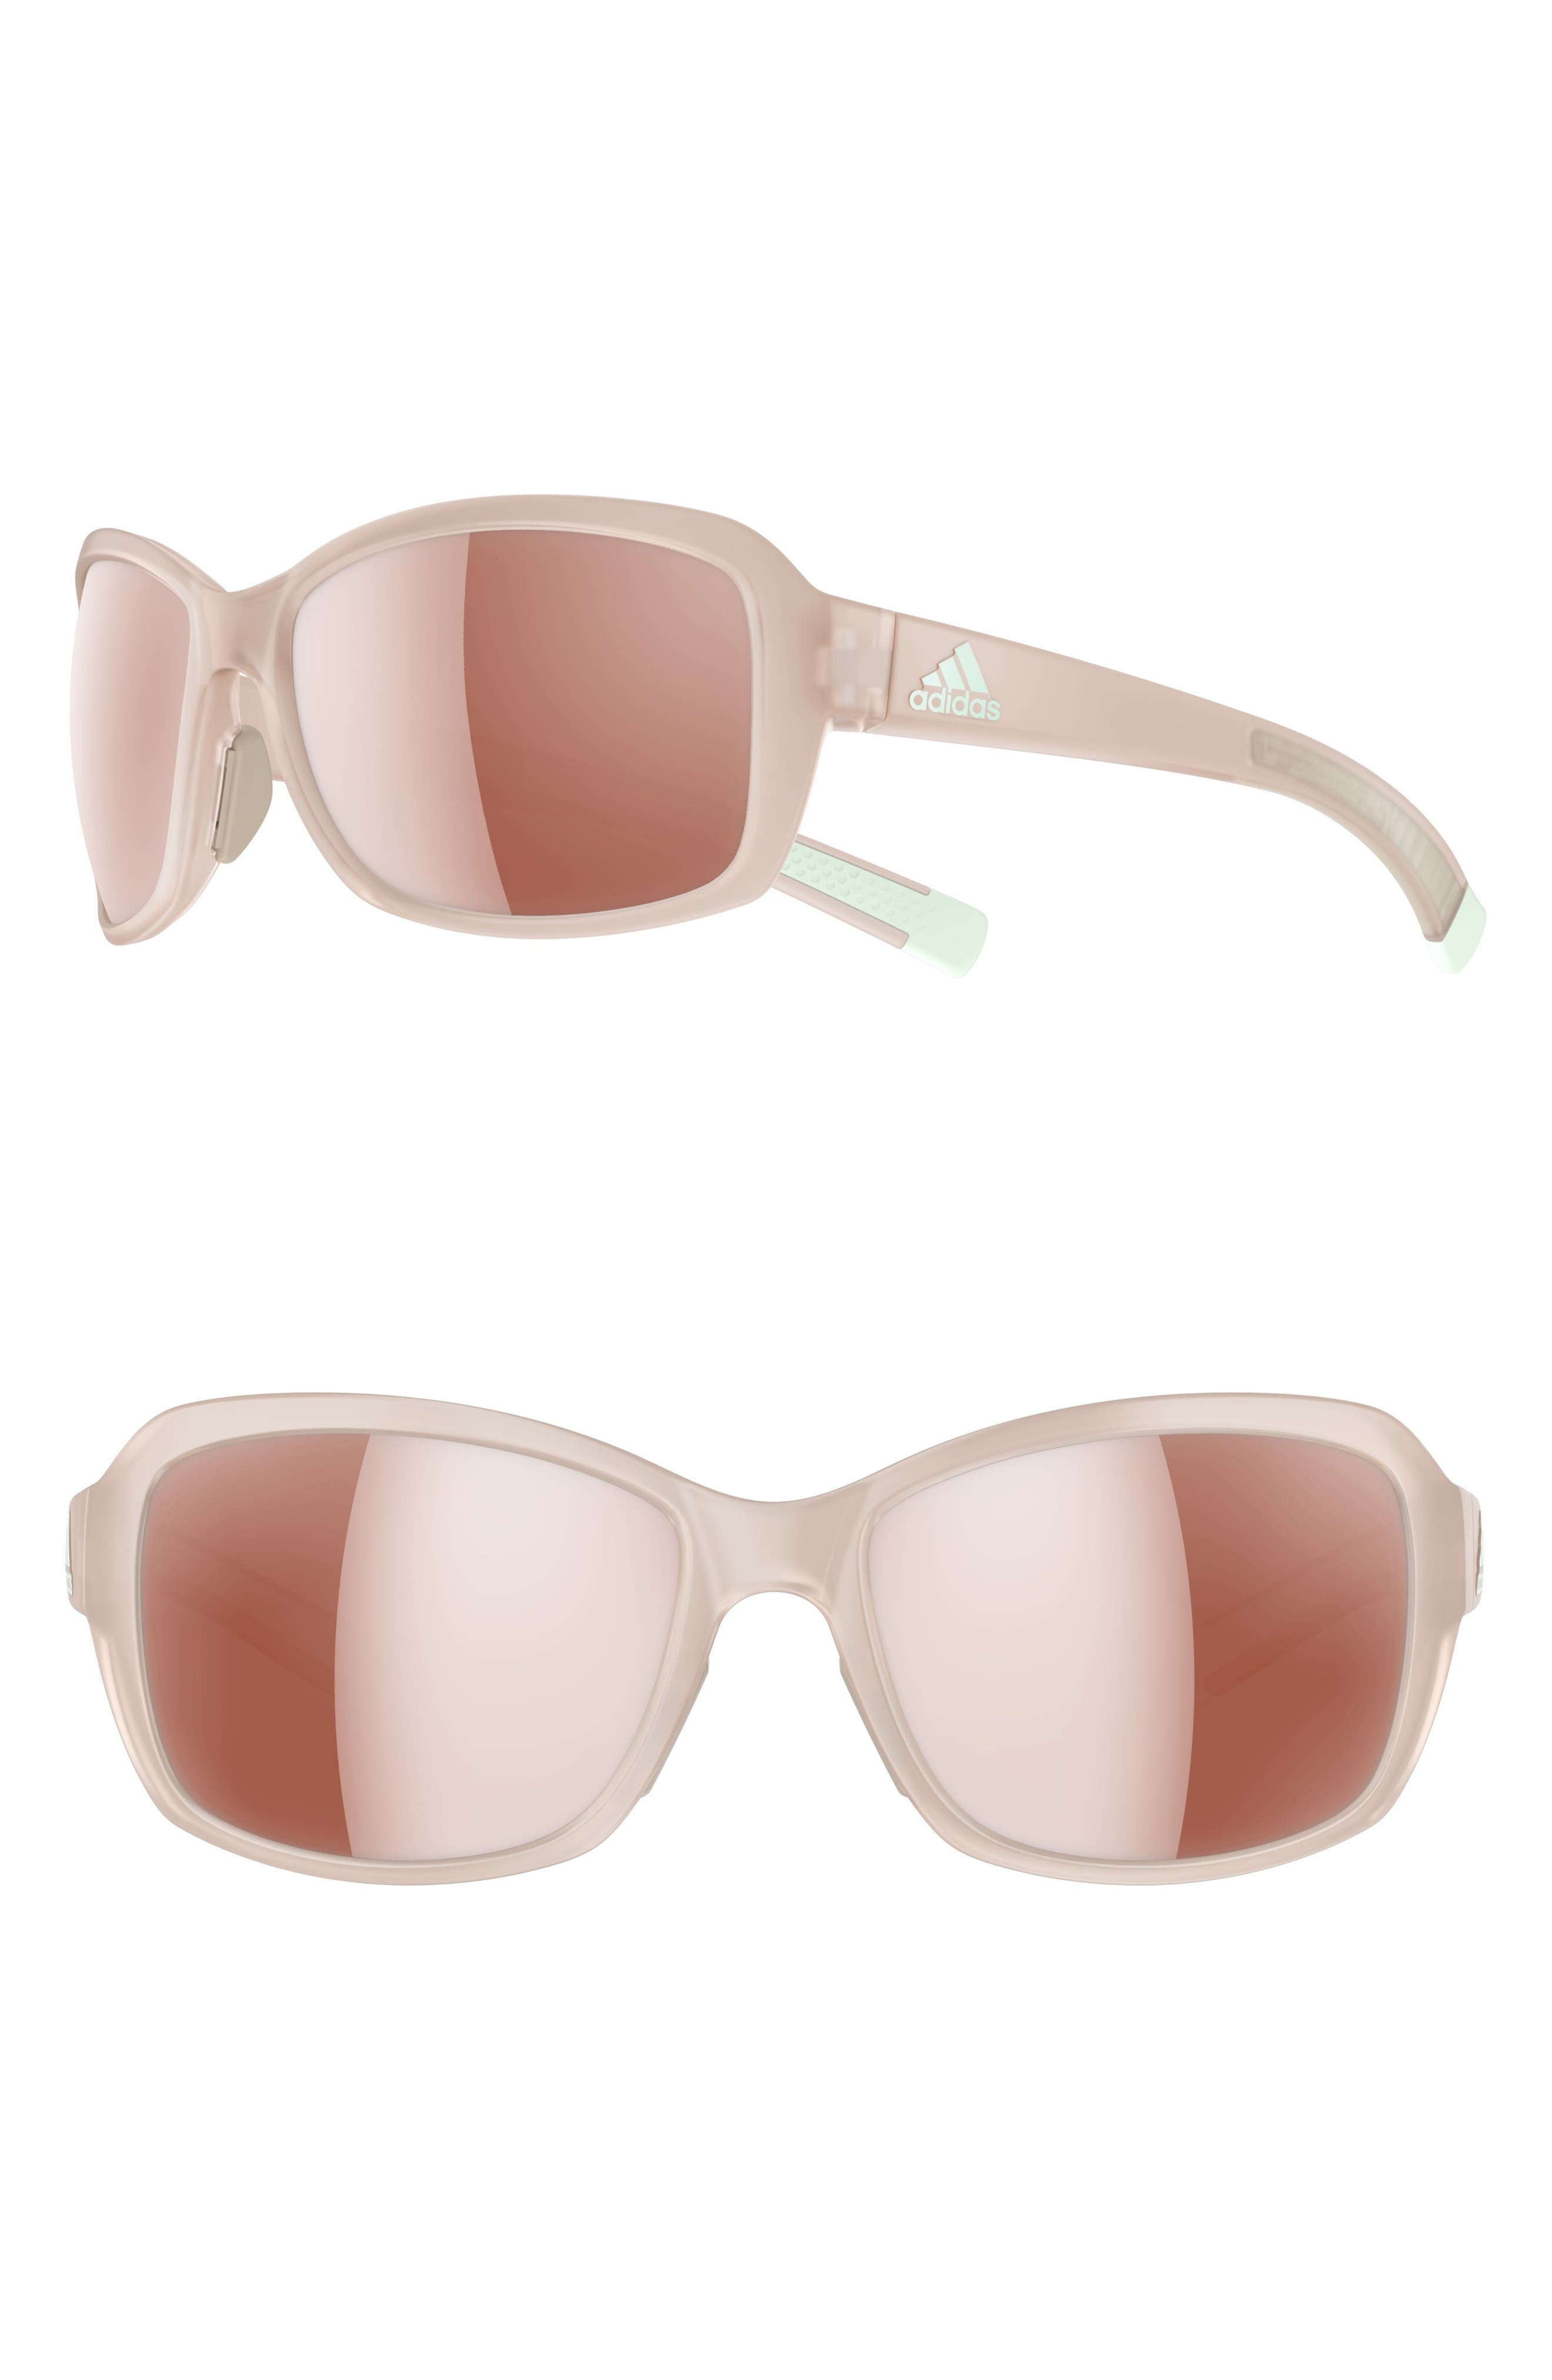 ADIDAS, Baboa 55mm Sport Sunglasses, Main thumbnail 1, color, MATTE GREY/ ACTIVE SILVER